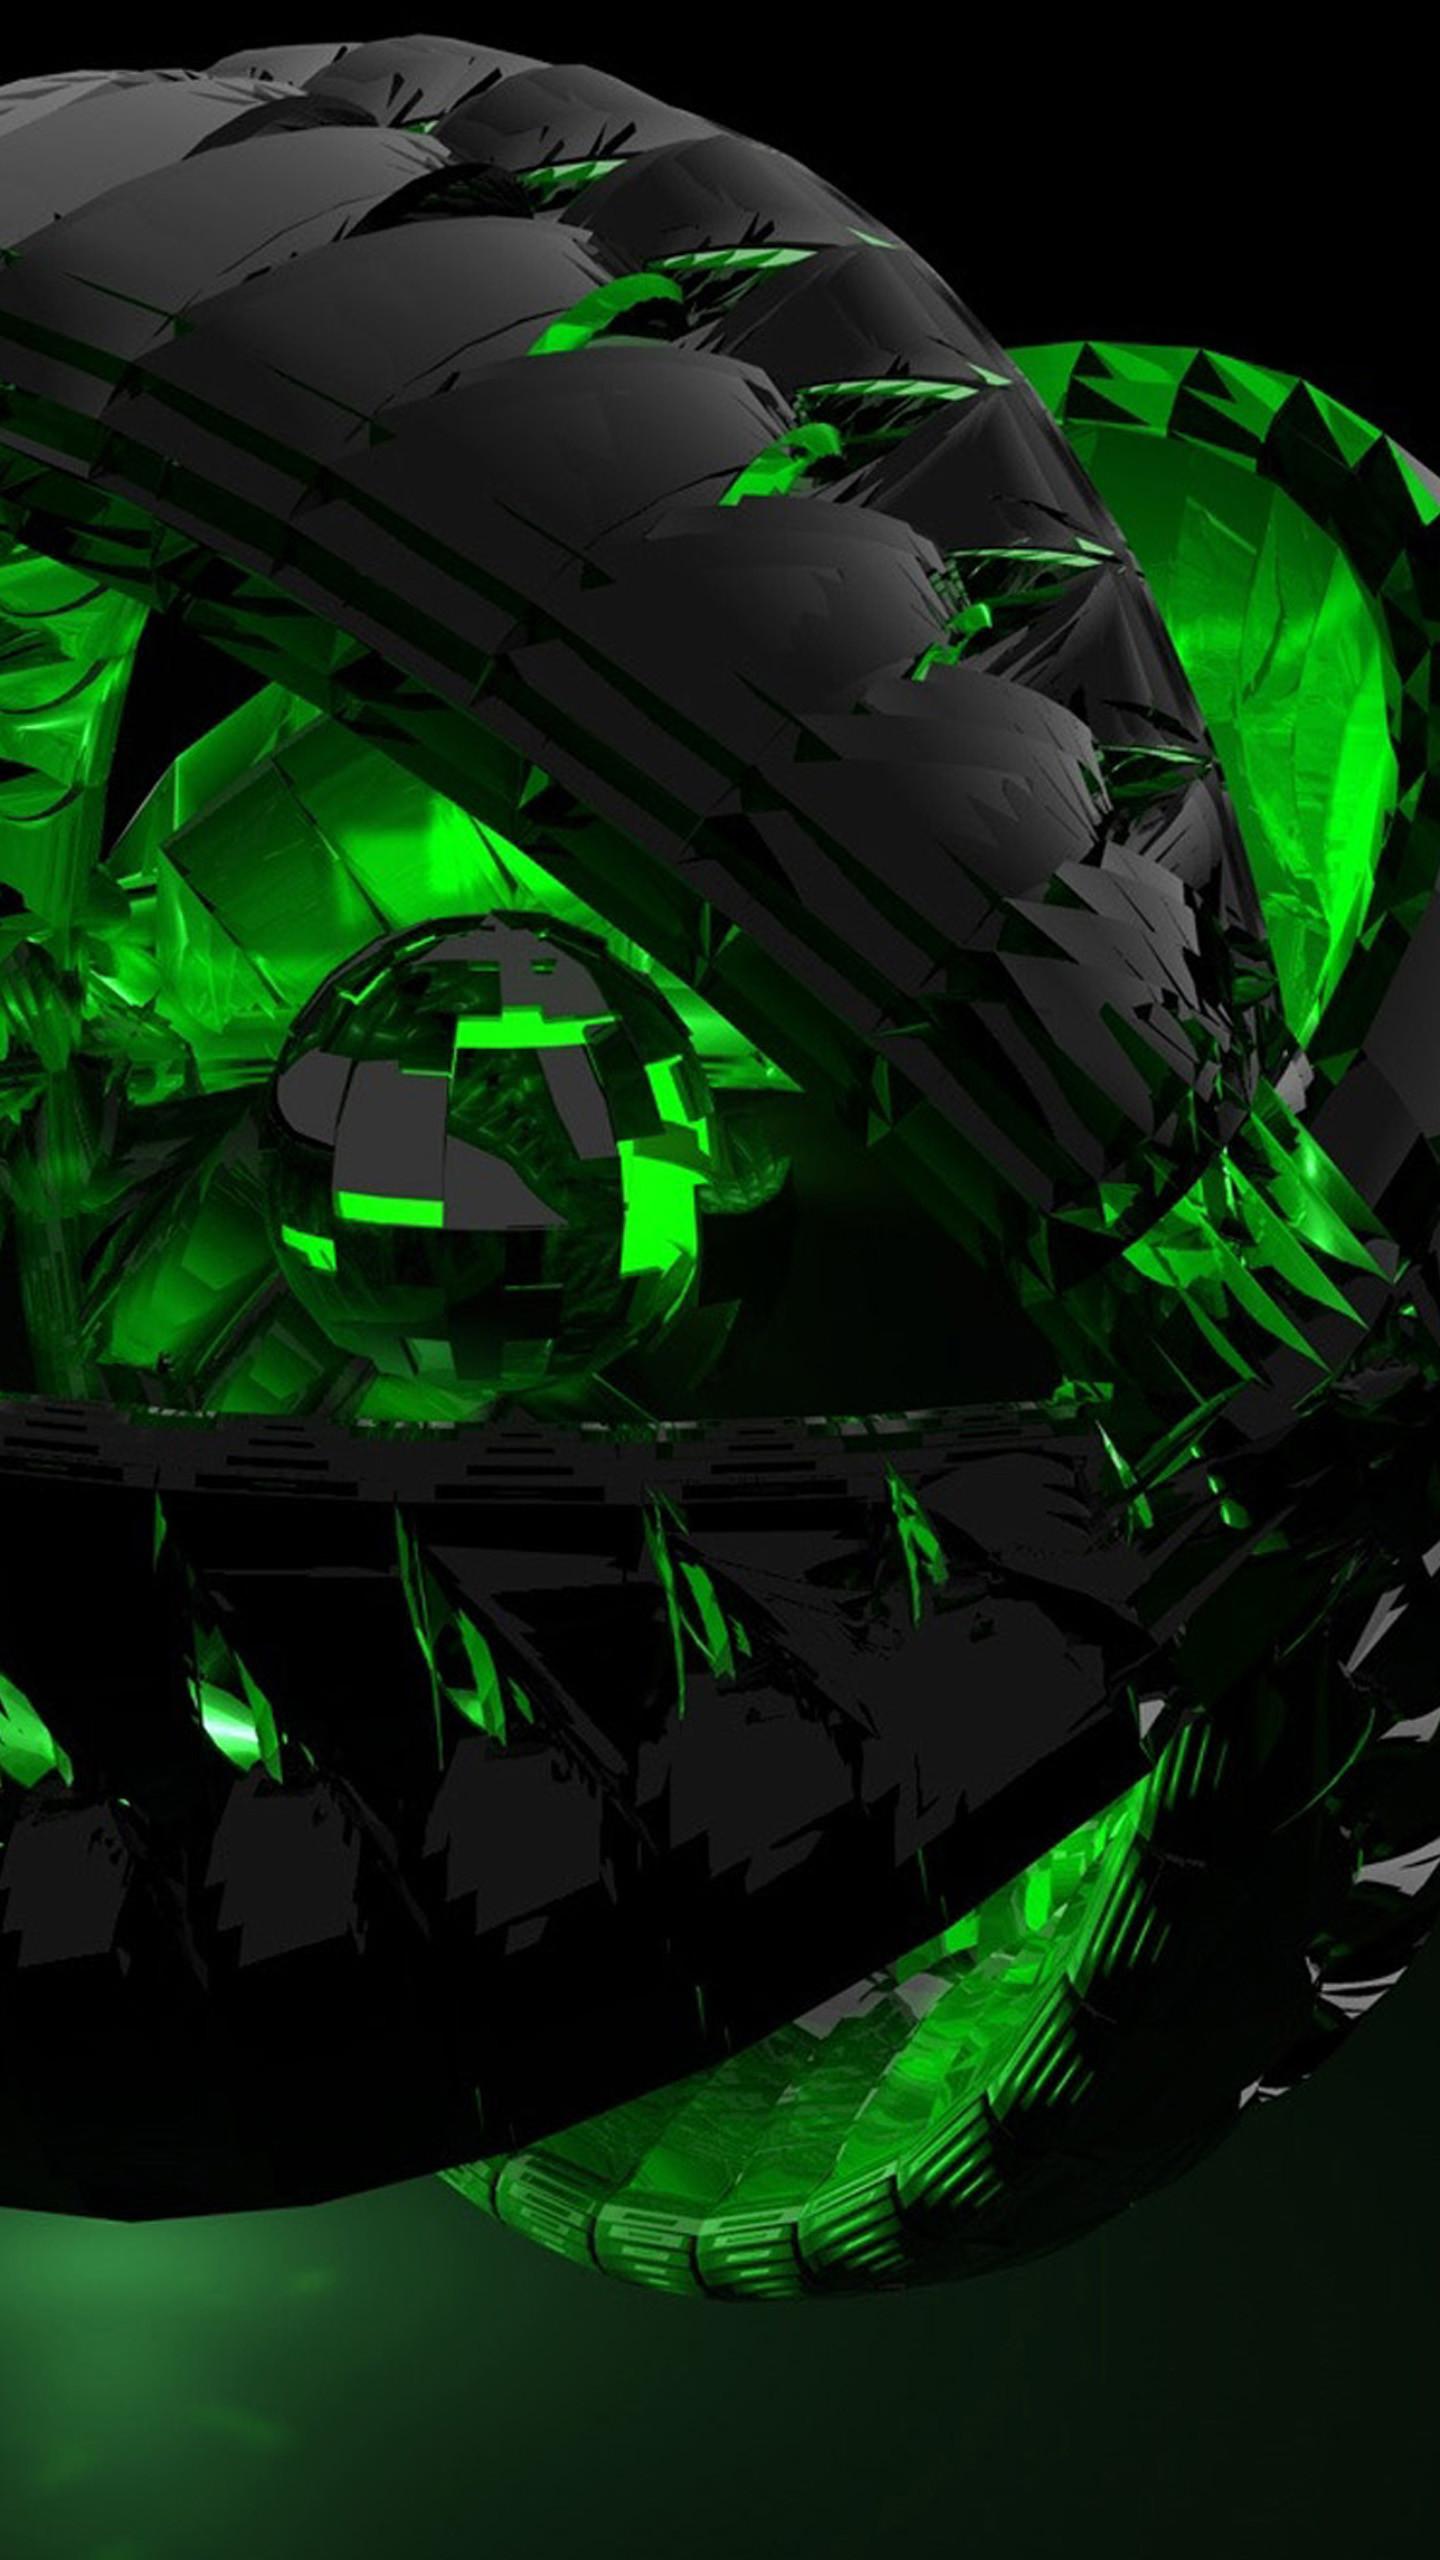 3D black and green Galaxy S6 Wallpaper